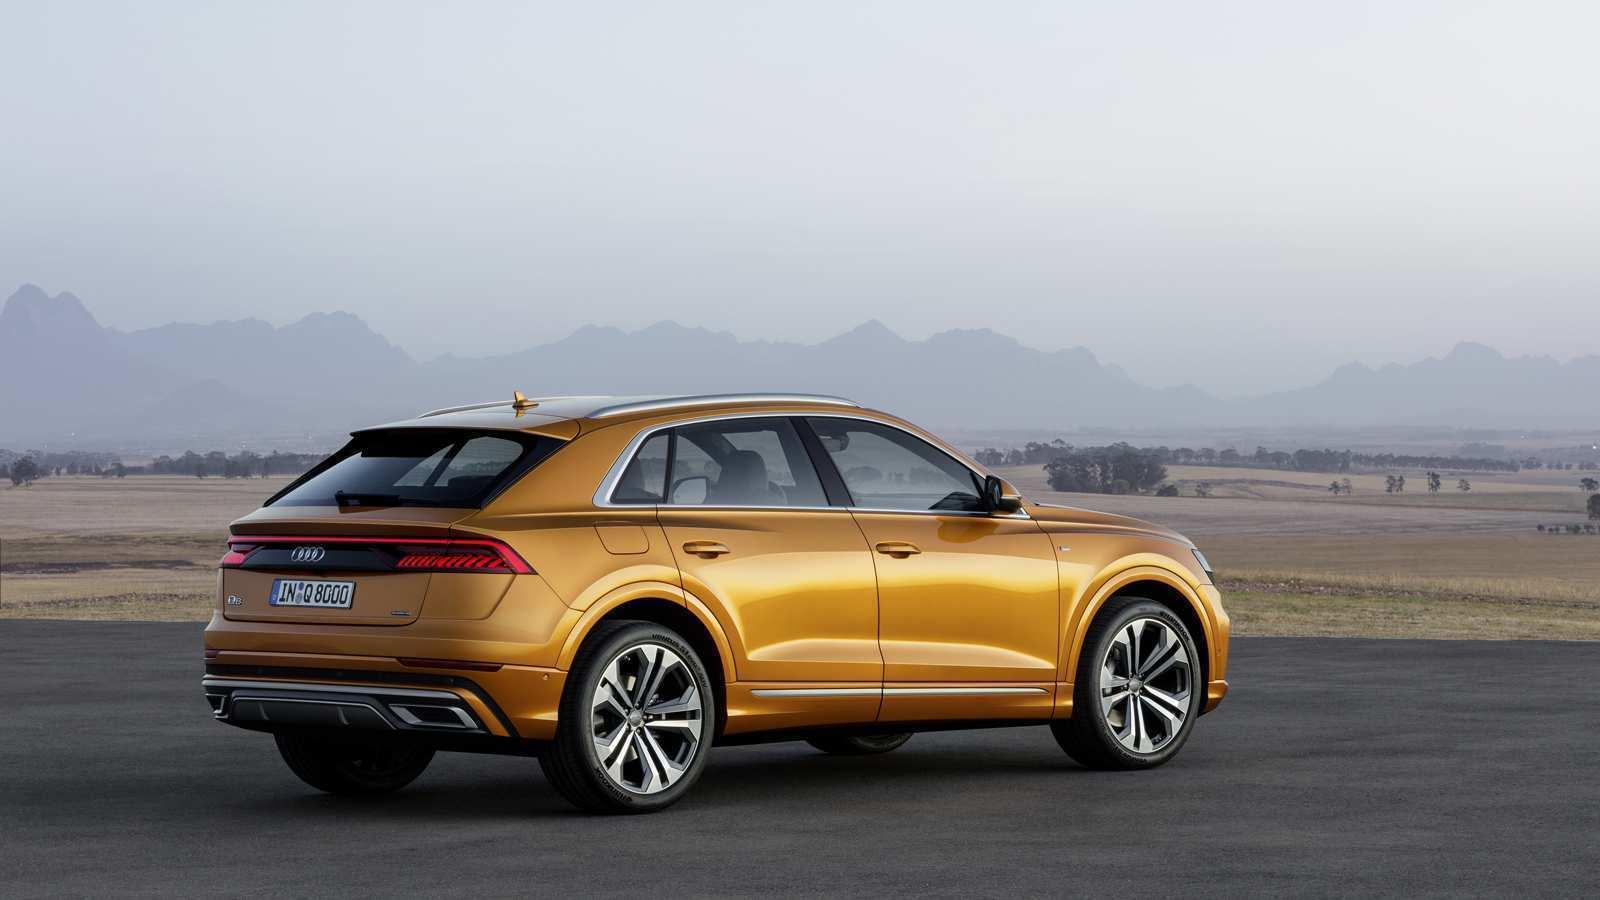 88 Concept of 2019 Audi Hybrid History for 2019 Audi Hybrid